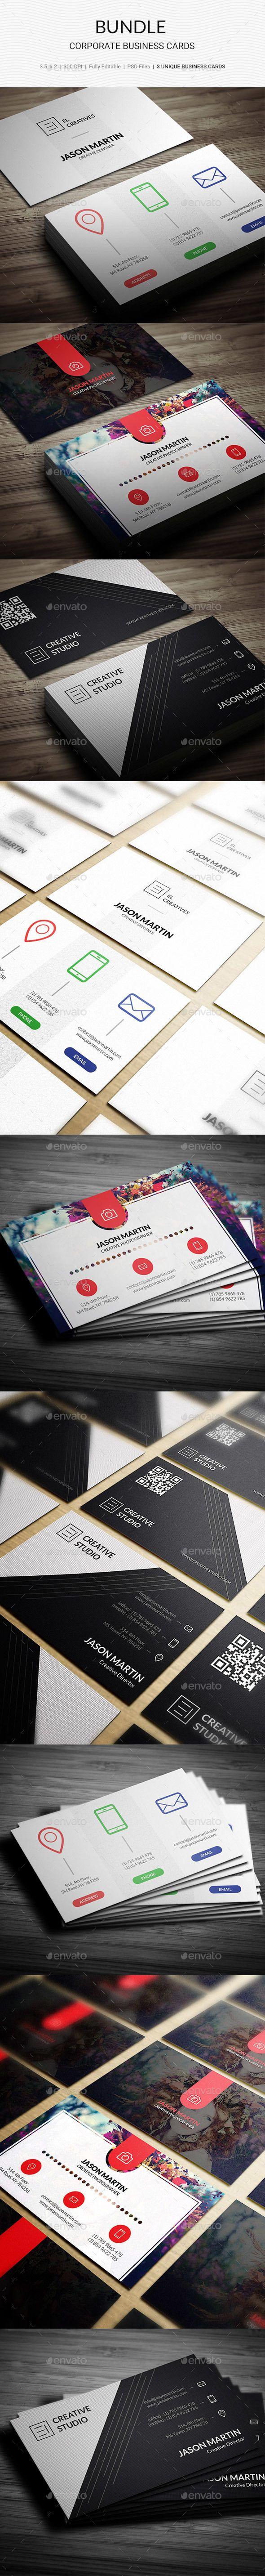 Bundle - Creaitve Business Cards - 3 in 1 - 164 - Creative #Business #Cards